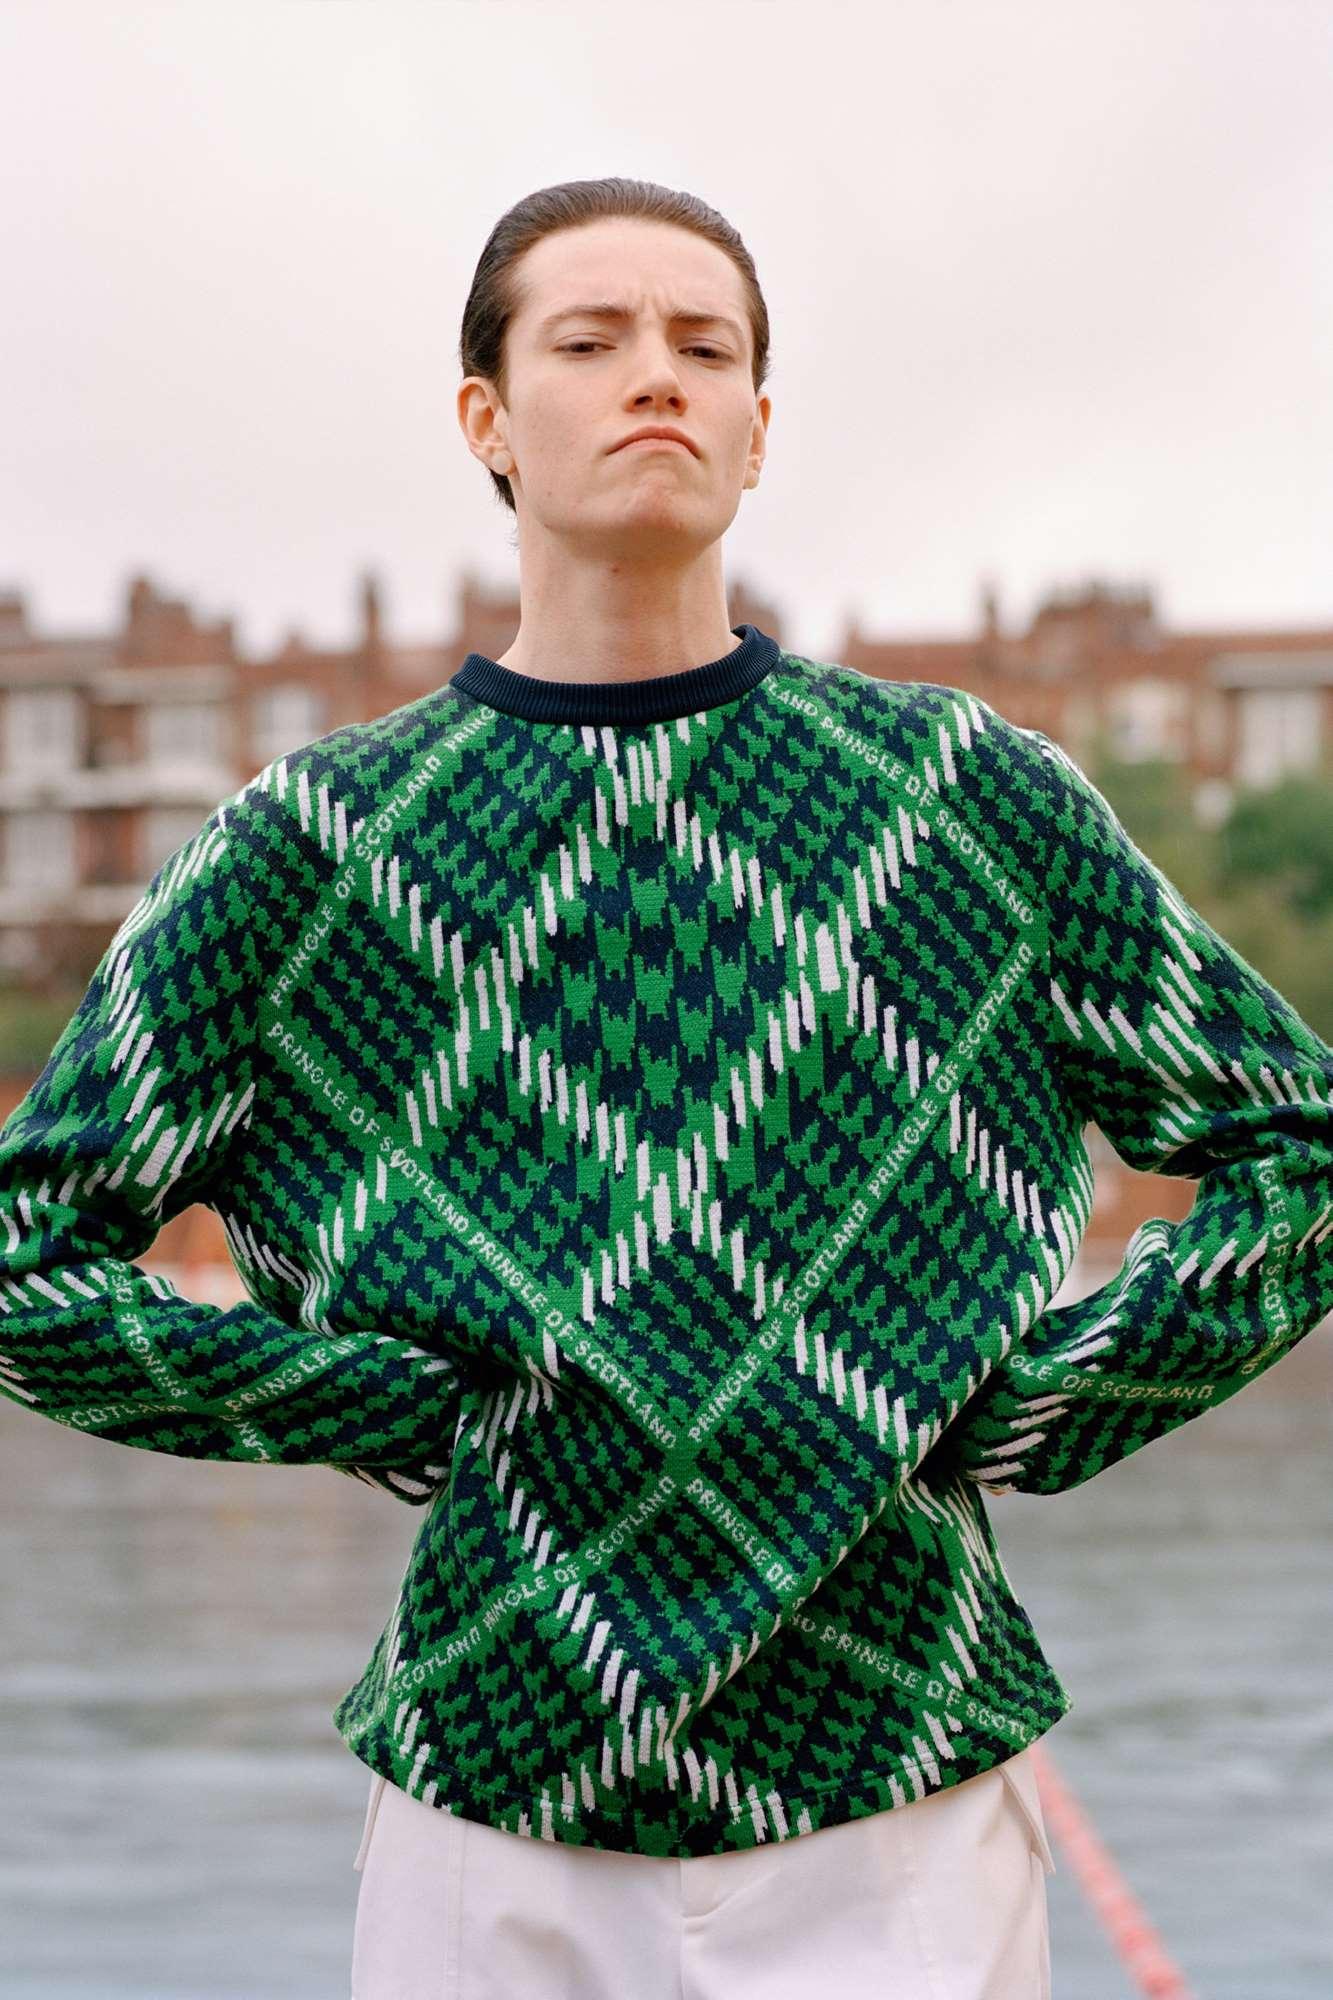 Pringle of Scotland SS/2020 Pringle of Scotland SS/2020 Vanity Teen Menswear & new faces magazine